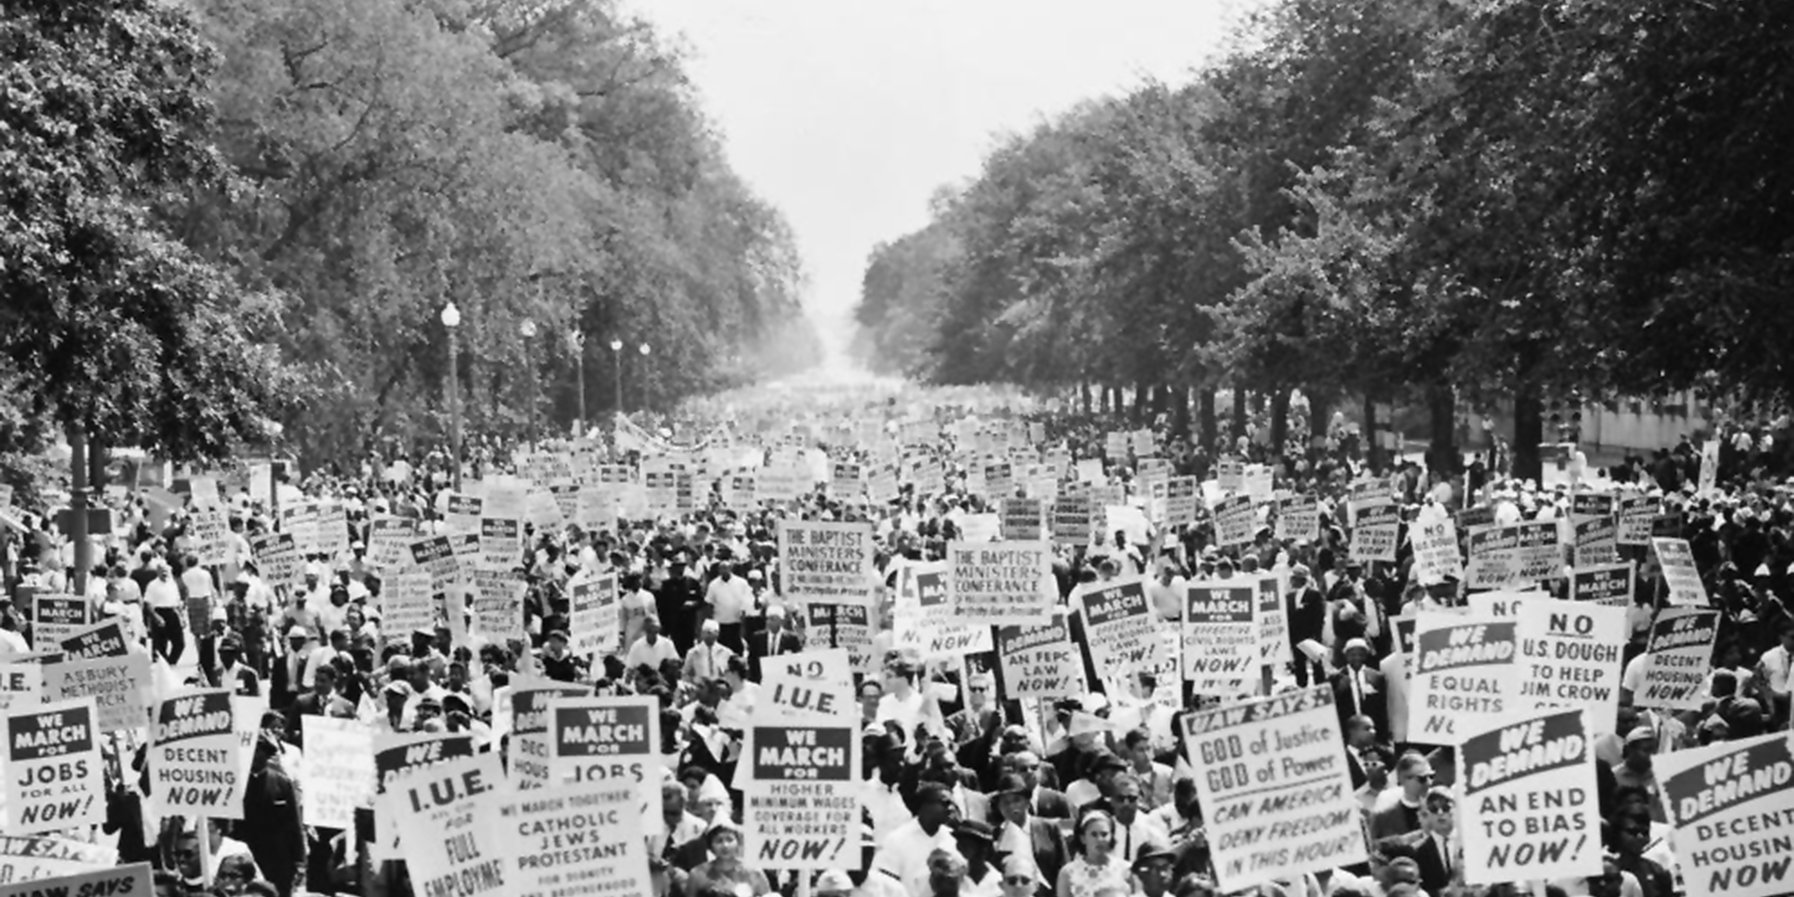 Civil Rights Movement in the USA